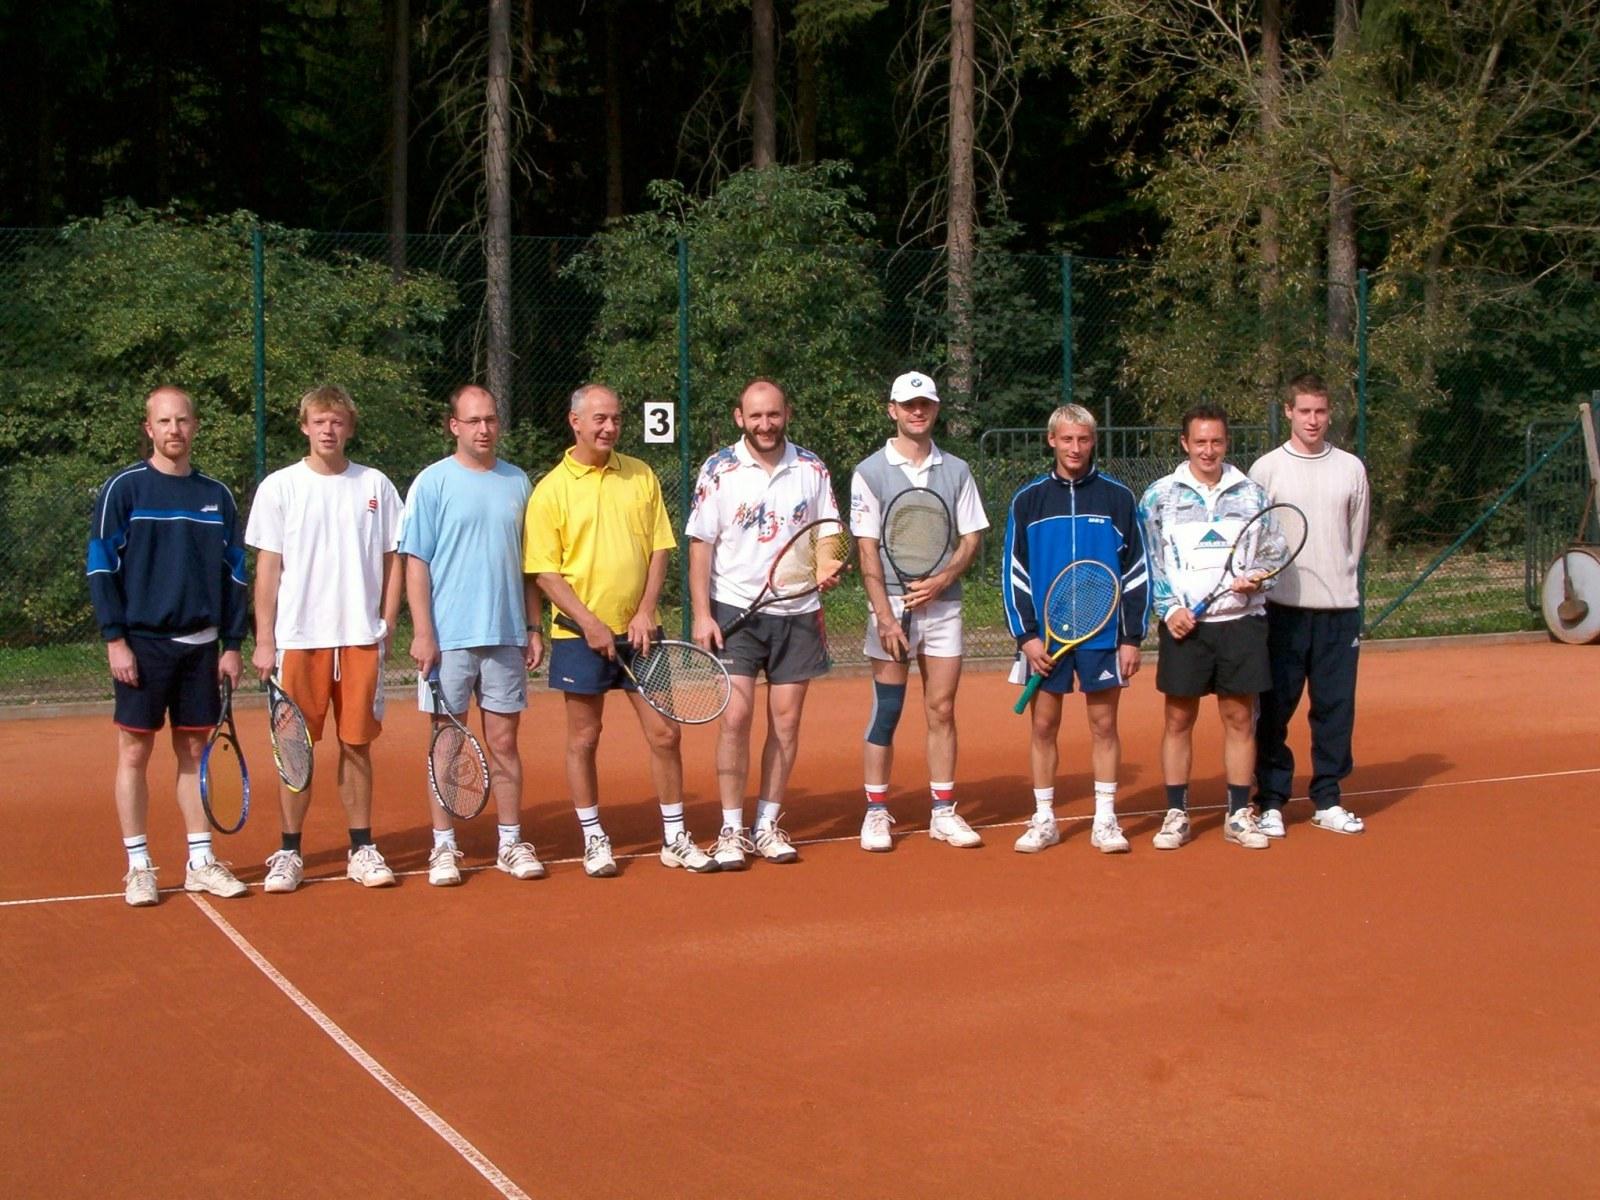 Erzgebirgsmeisterschaften bei uns 2007